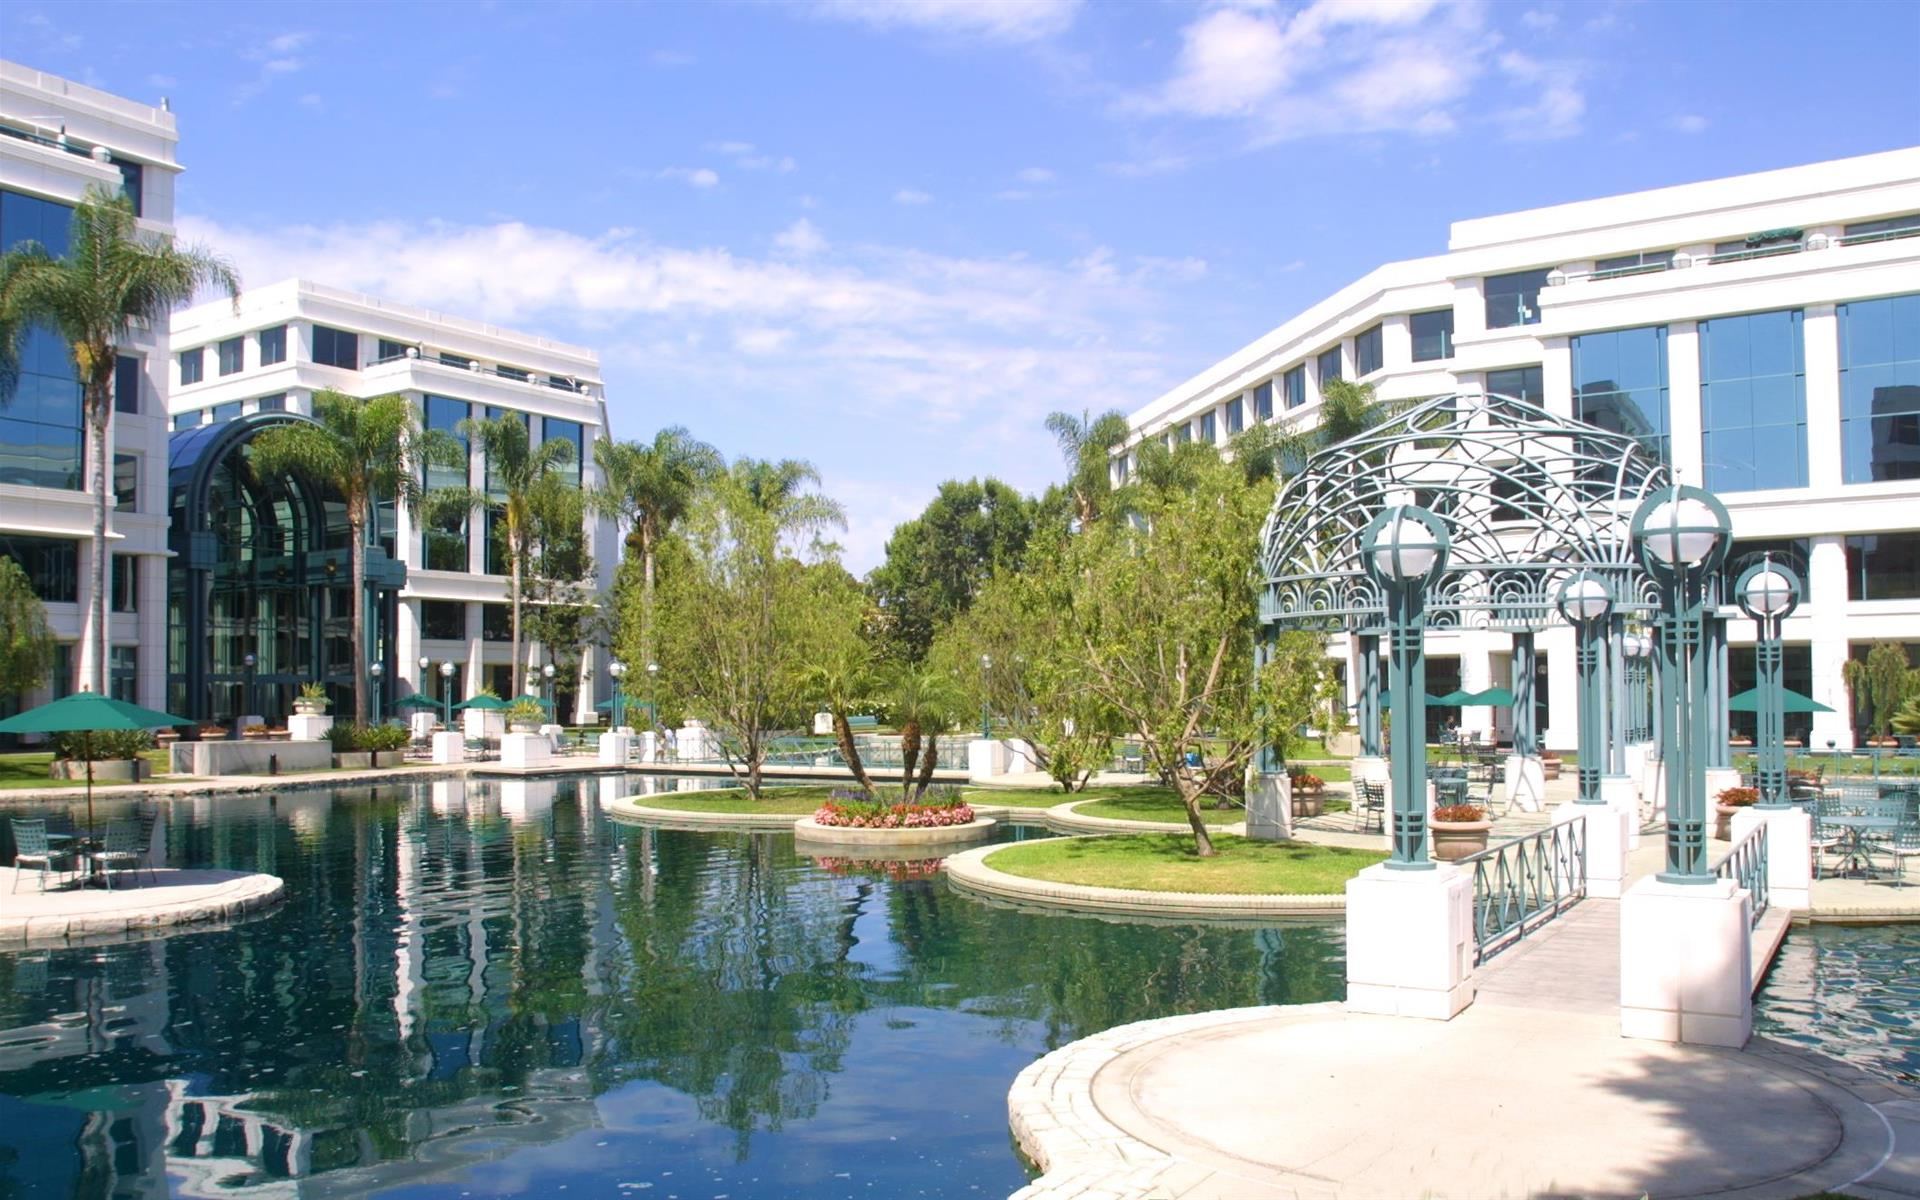 (SM2) The Water Garden